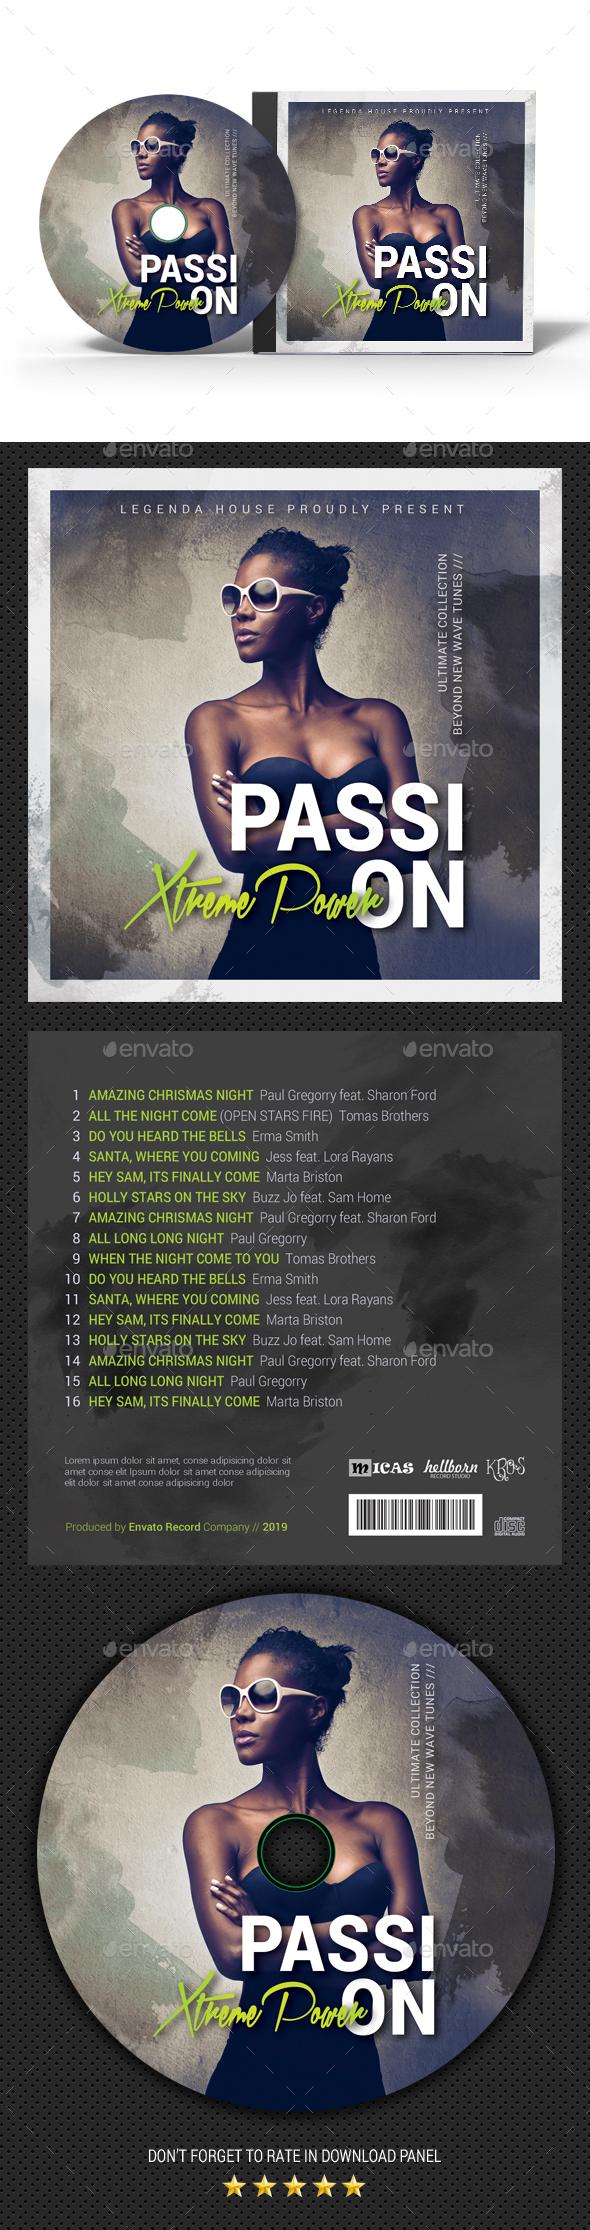 Passion Music CD Cover - CD & DVD Artwork Print Templates